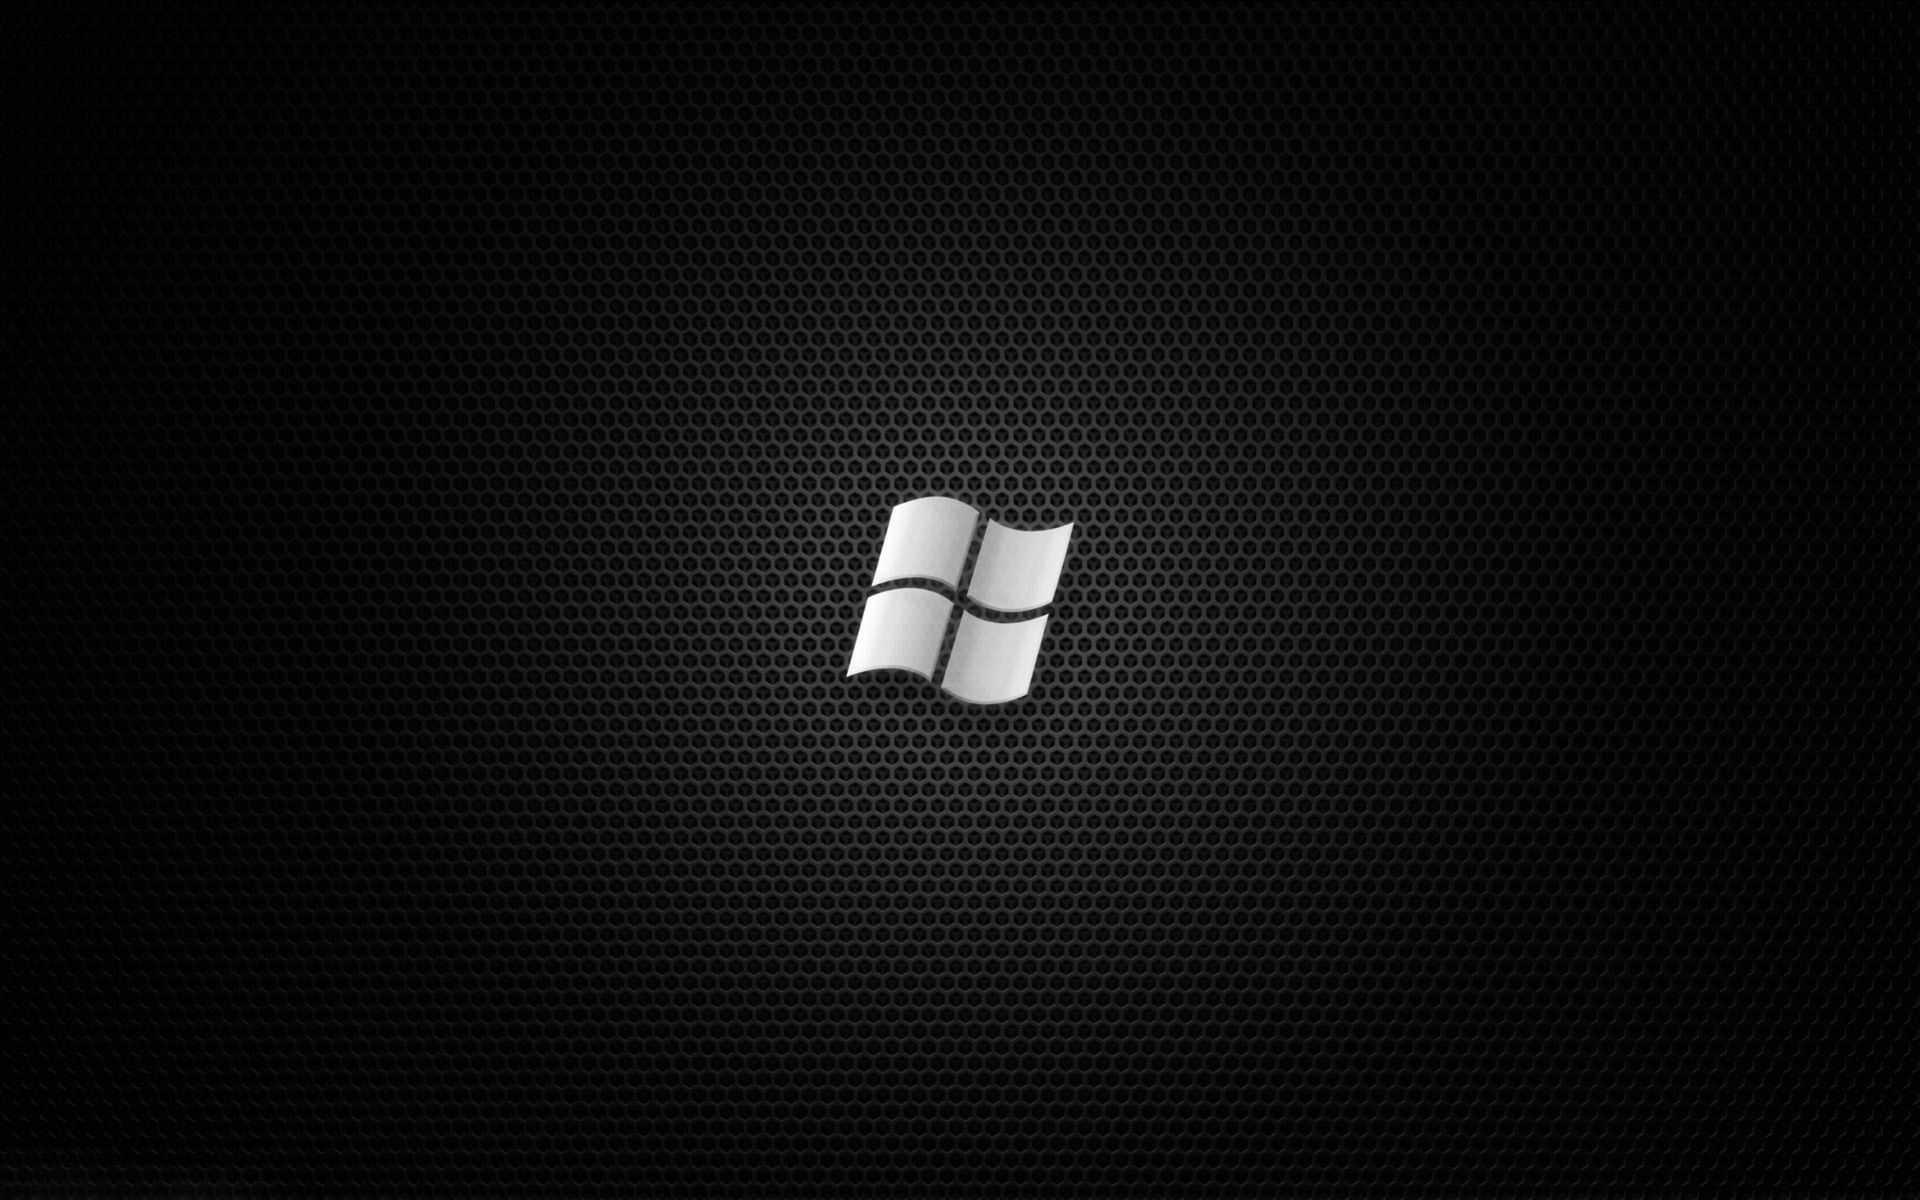 Hd wallpaper black and white - Windows Black Desktop Wallpapers